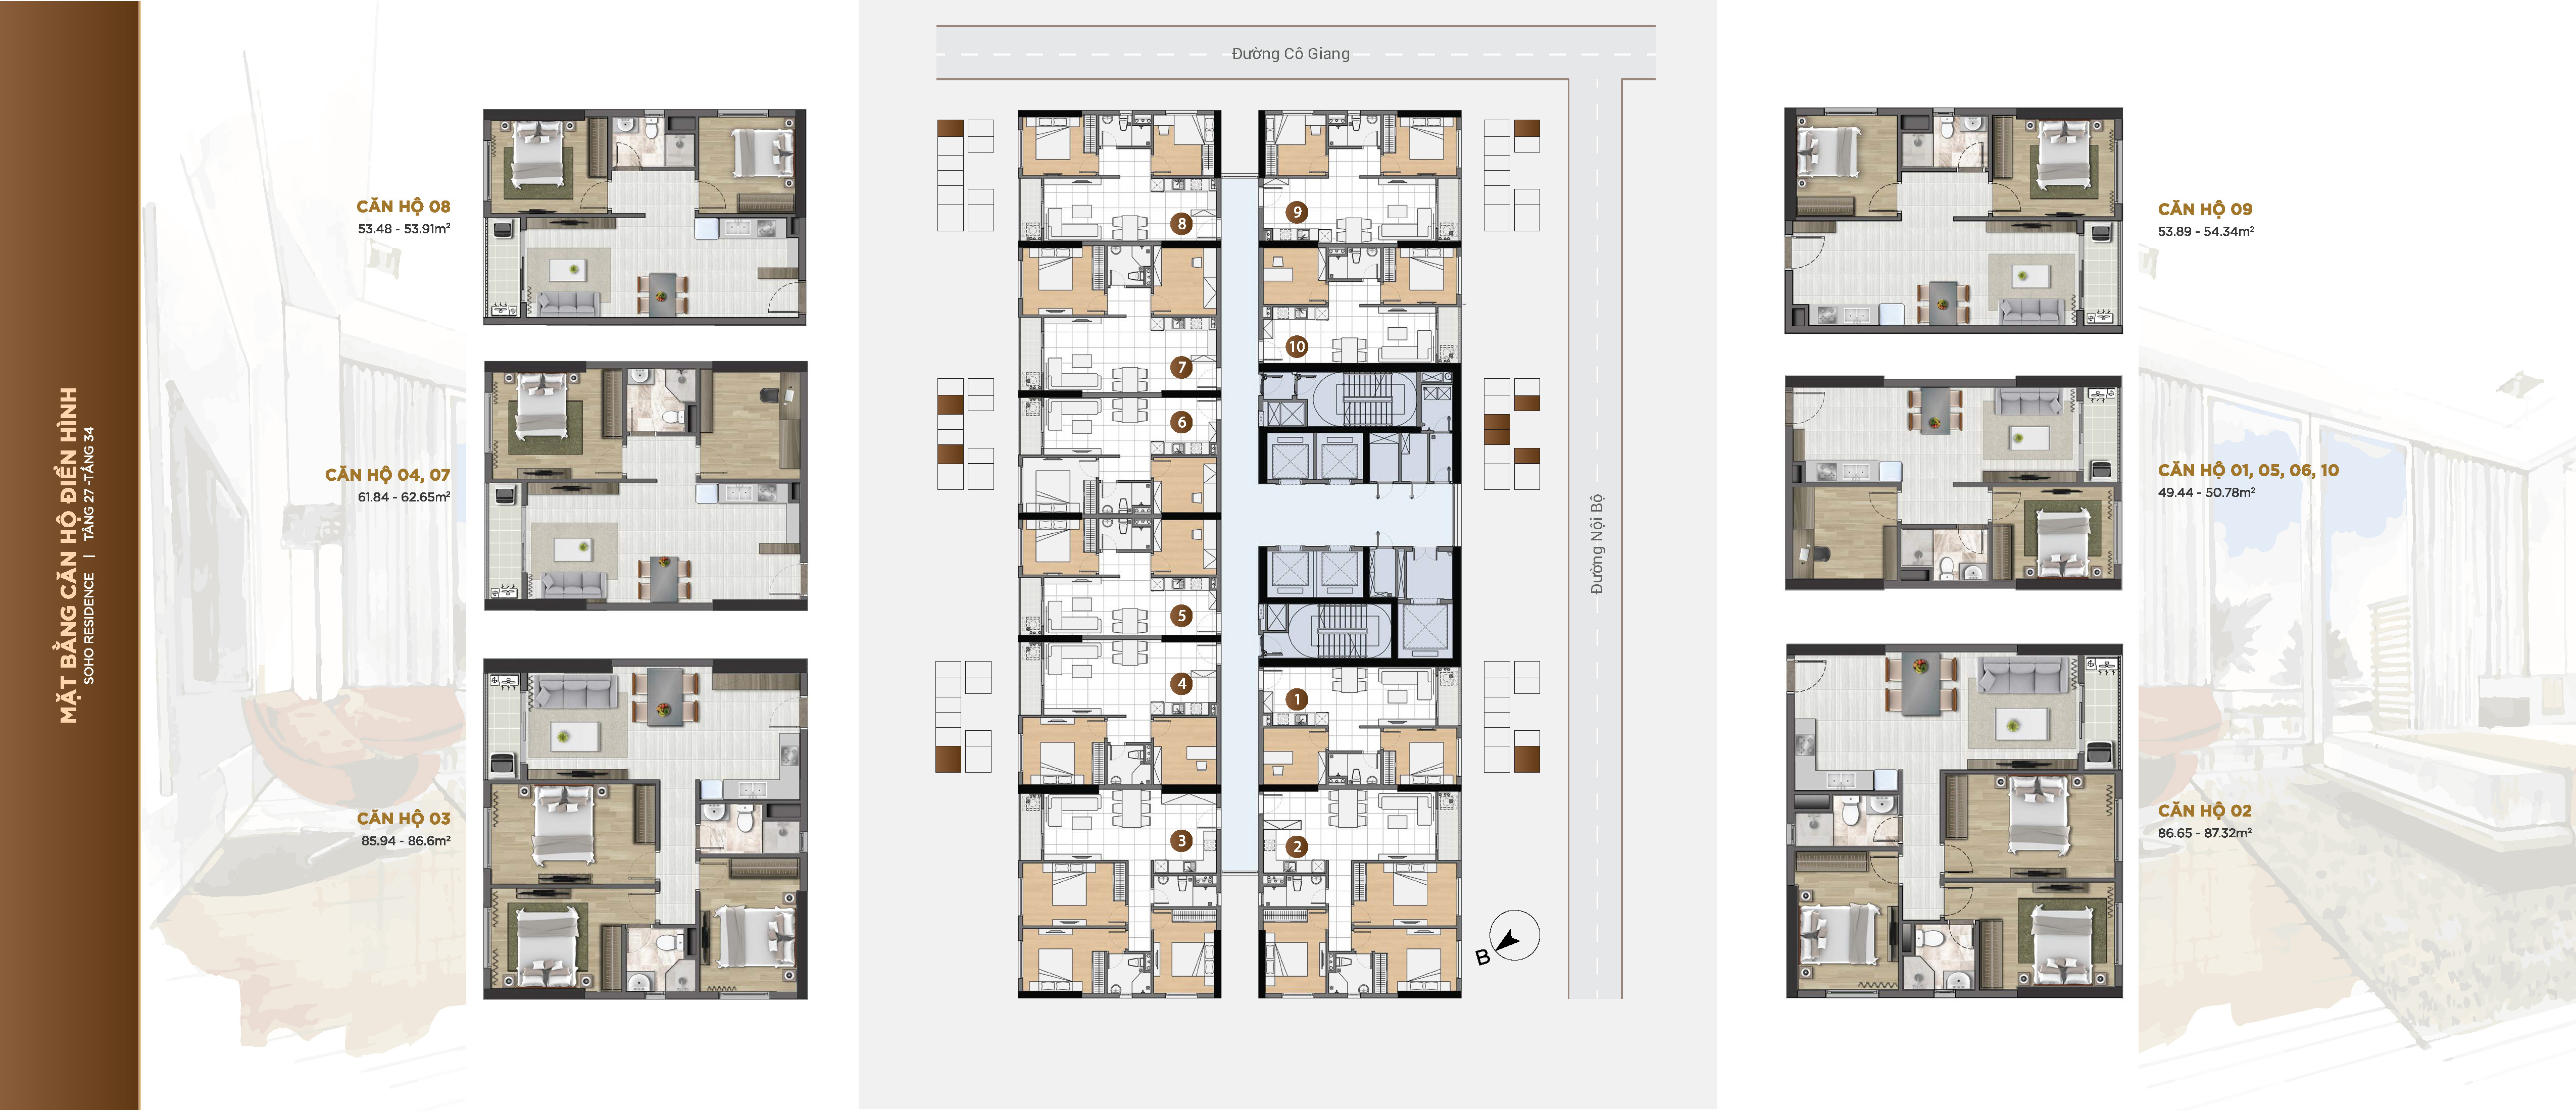 Mặt bằng căn hộ Soho Residence